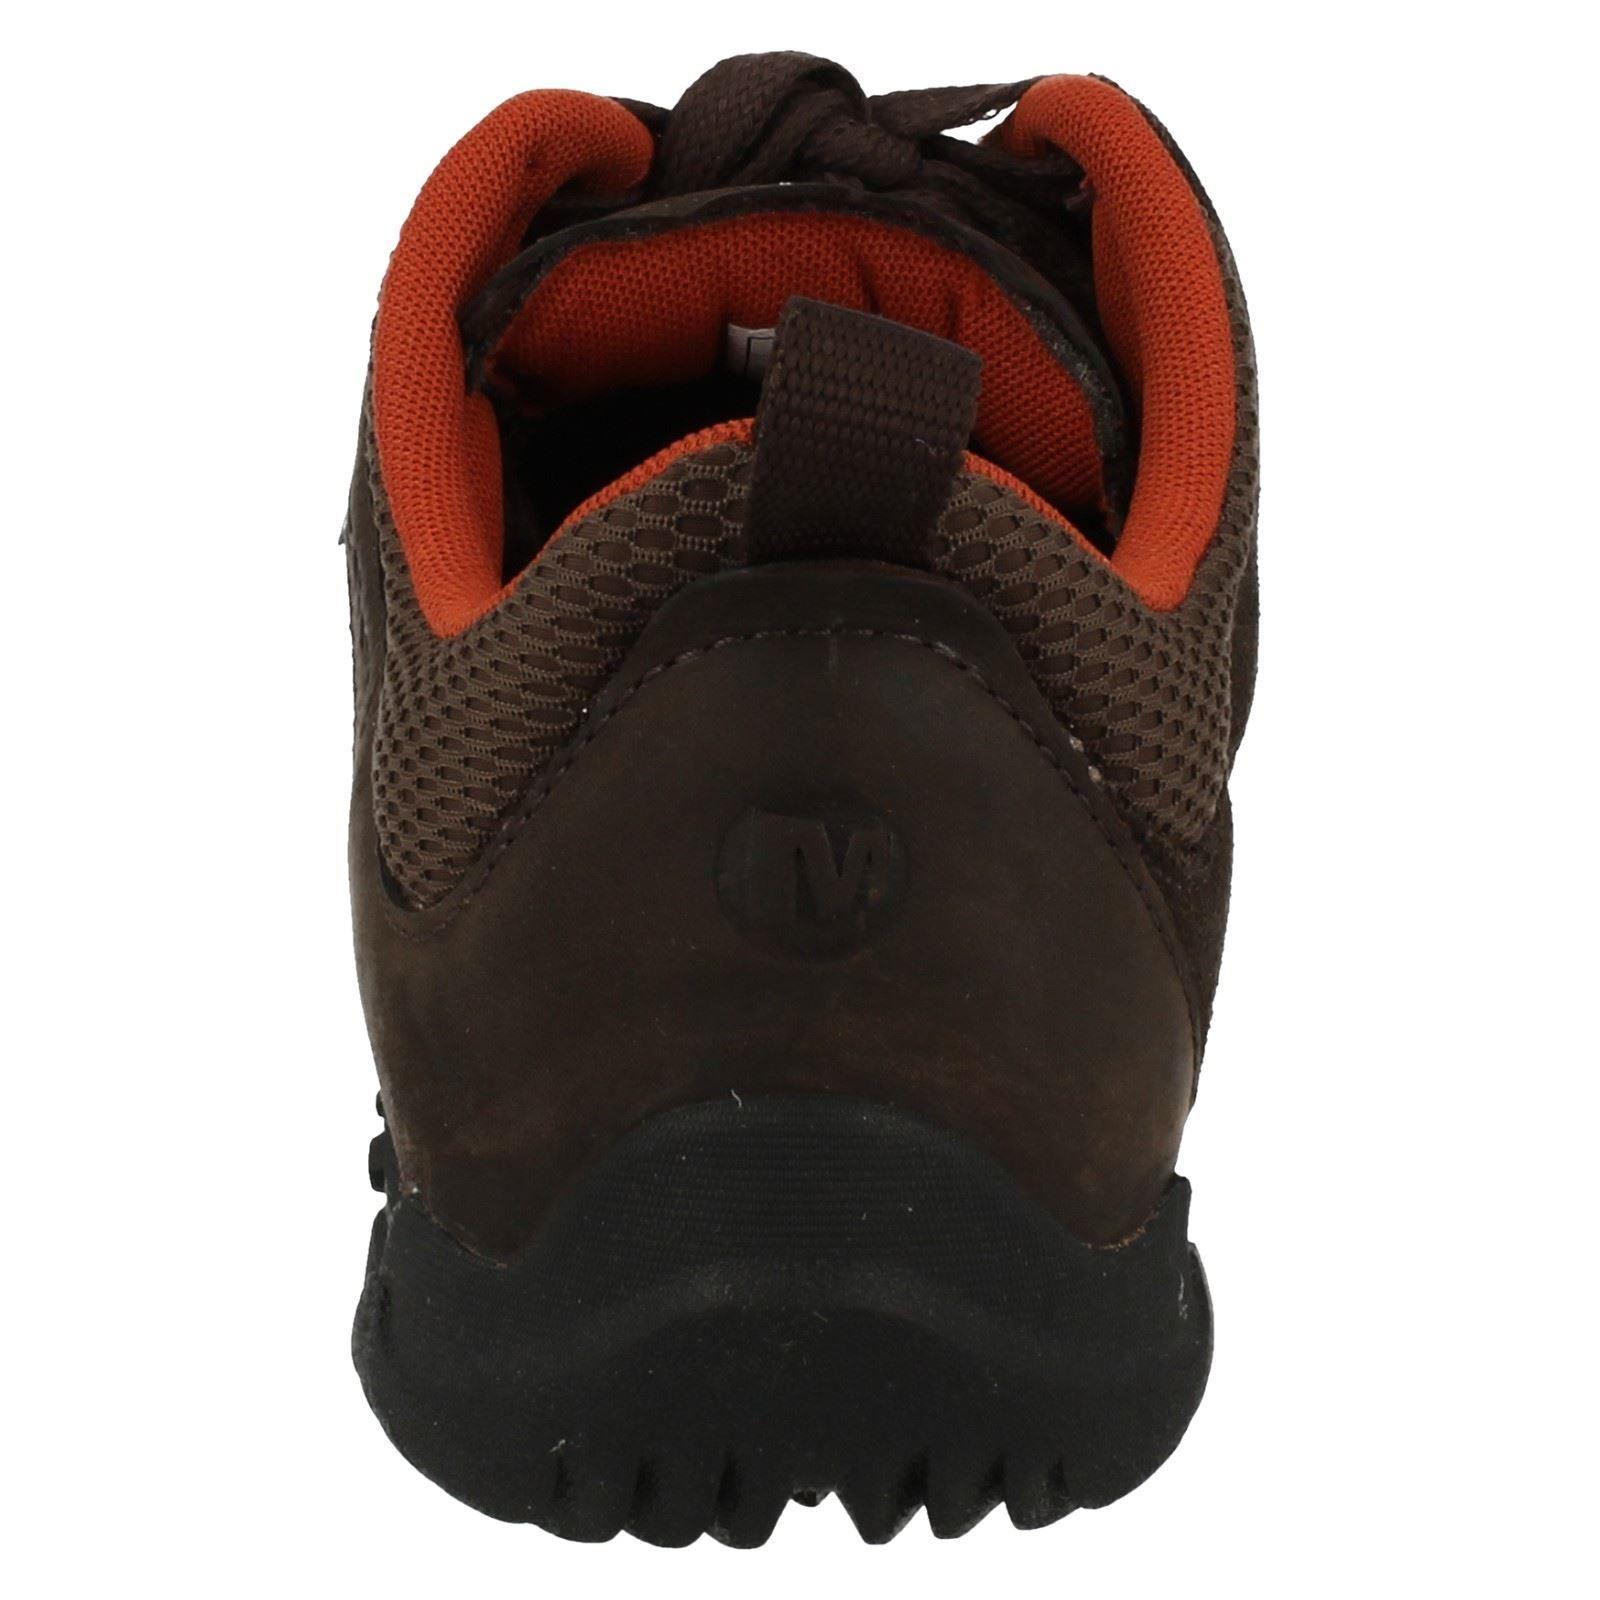 'telluride' Shoes Up brown Mens Espresso Lace Casual Merrell Iq8O7X